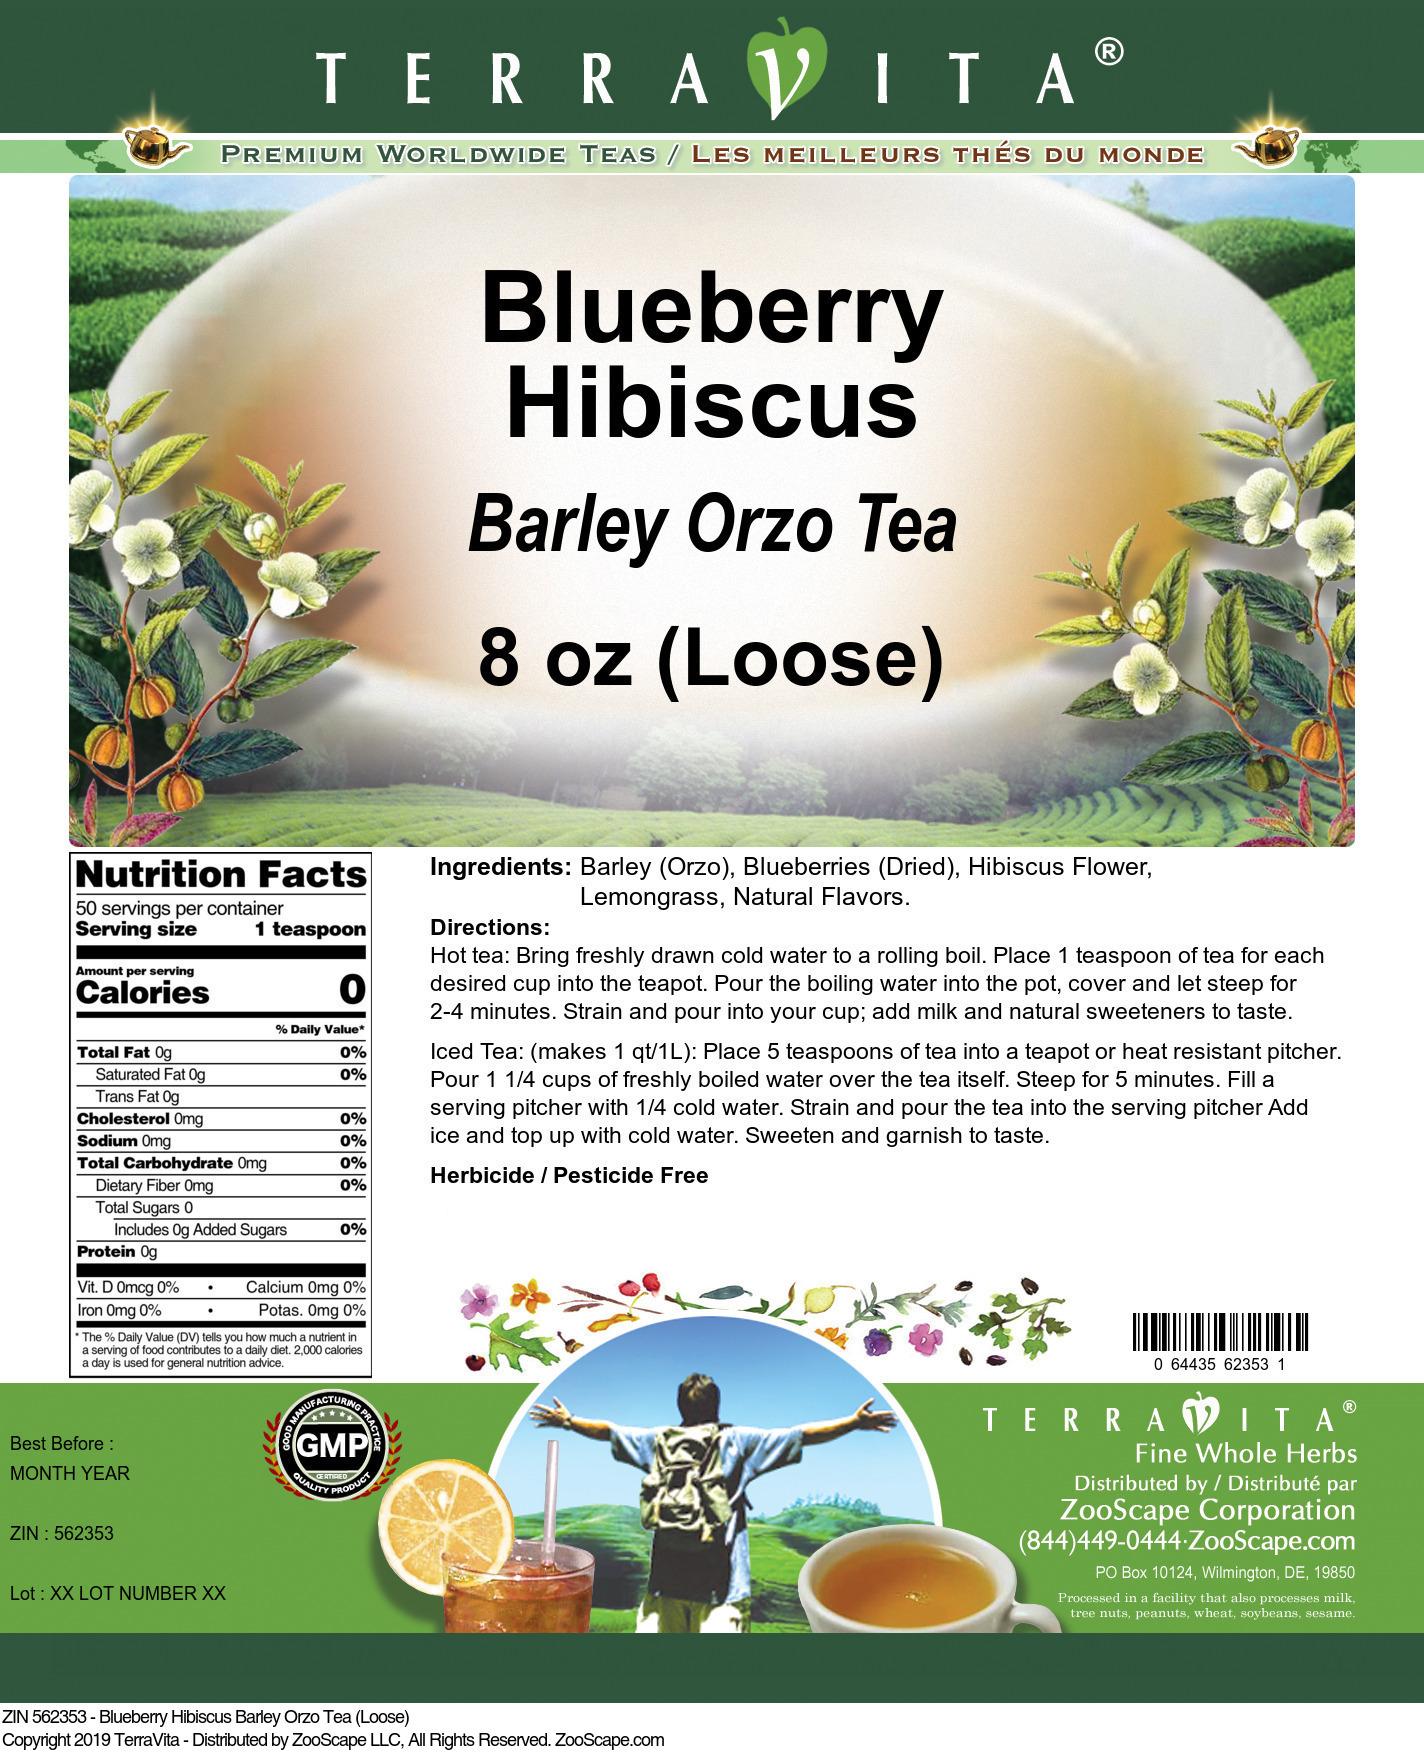 Blueberry Hibiscus Barley Orzo